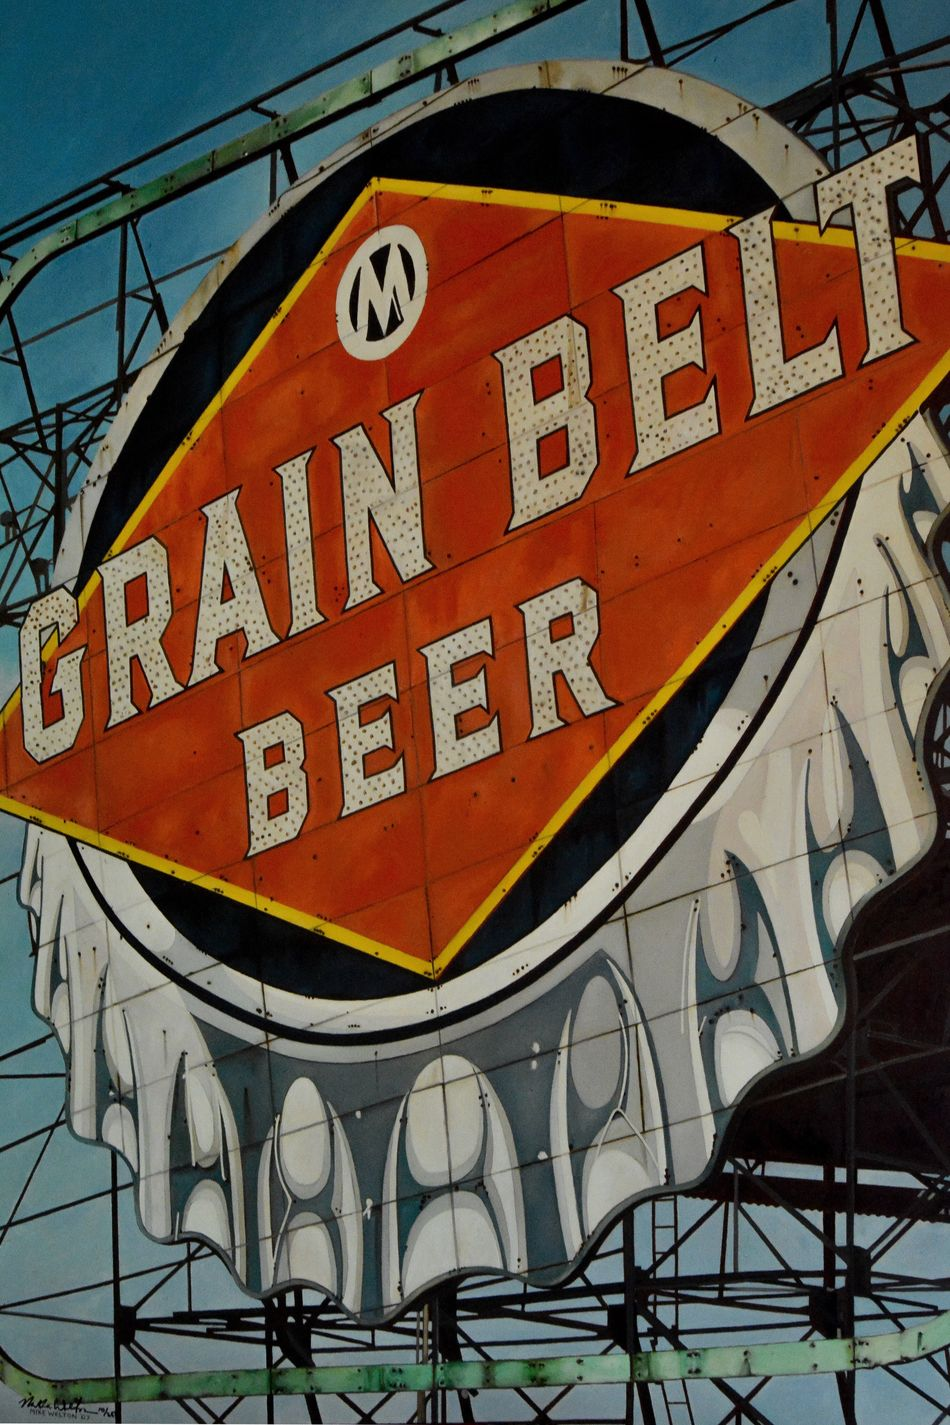 Grain Belt Beer Grain Belt Beer Sign Signage Minneapolis DowntownMPLS Iconic Urban Urban Landscape Urban Icon Old Historic Painting Likeness Sam Kratzer